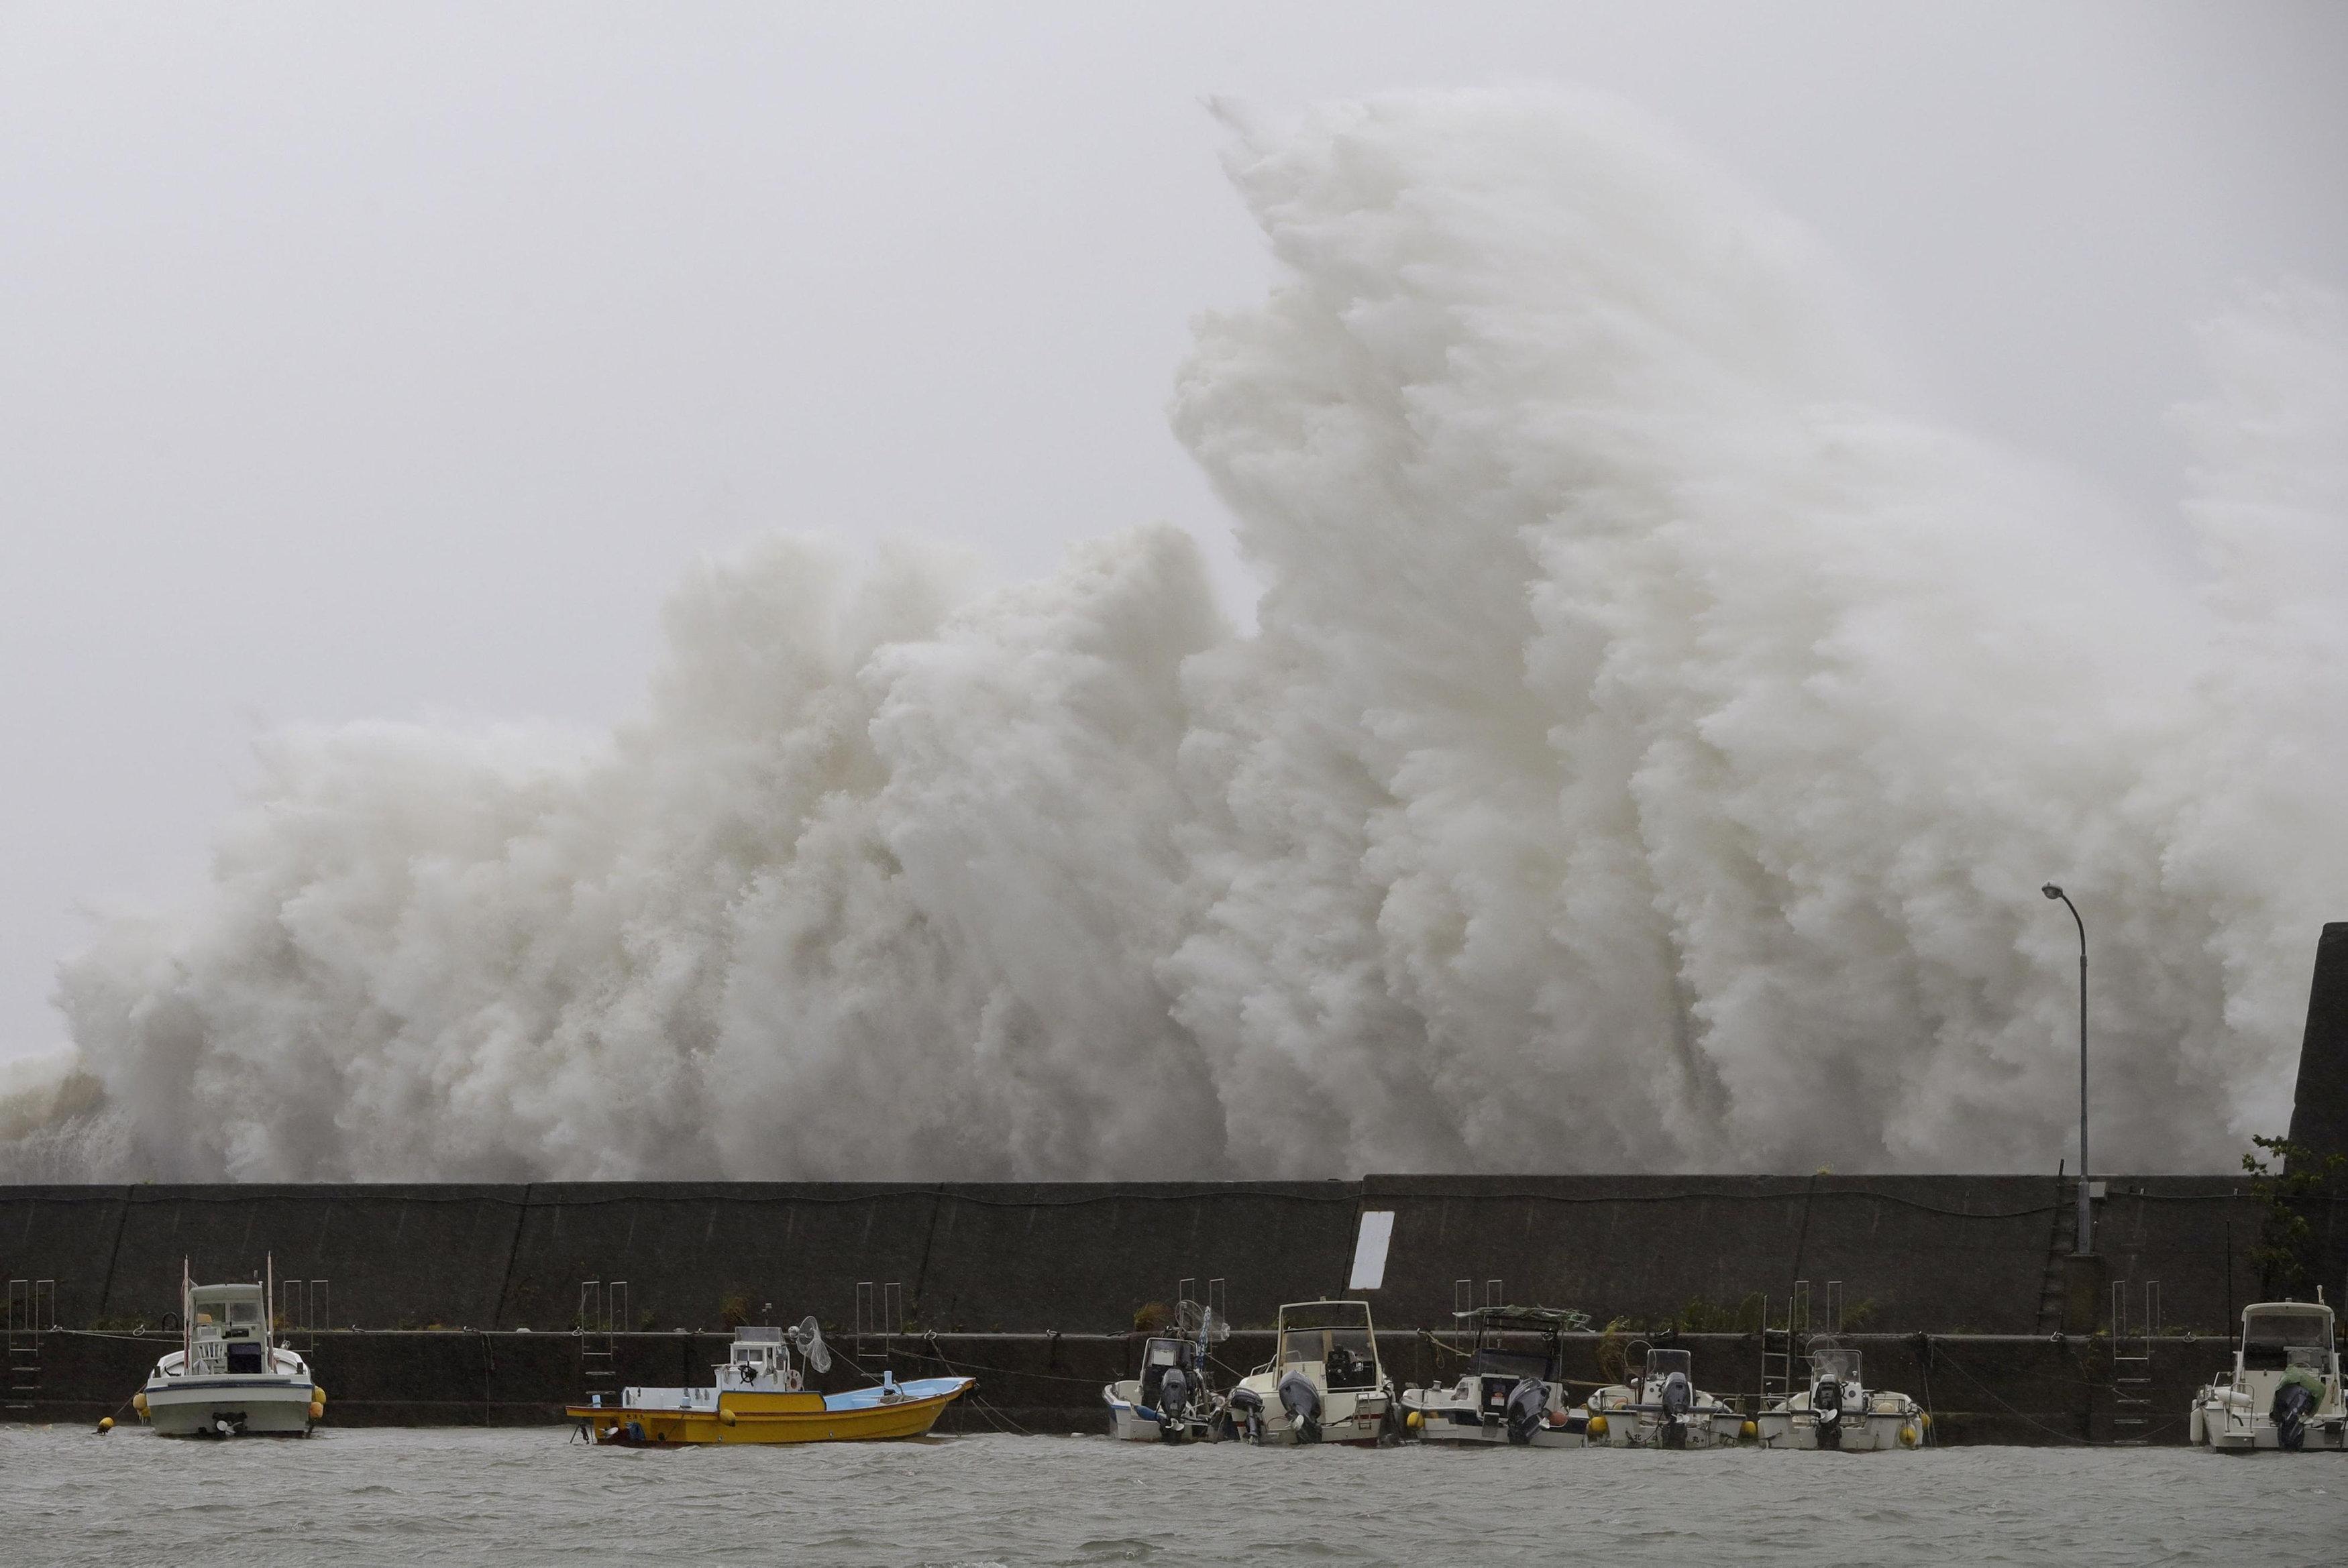 Typhoon Noru makes landfall, batters central Japan with rain